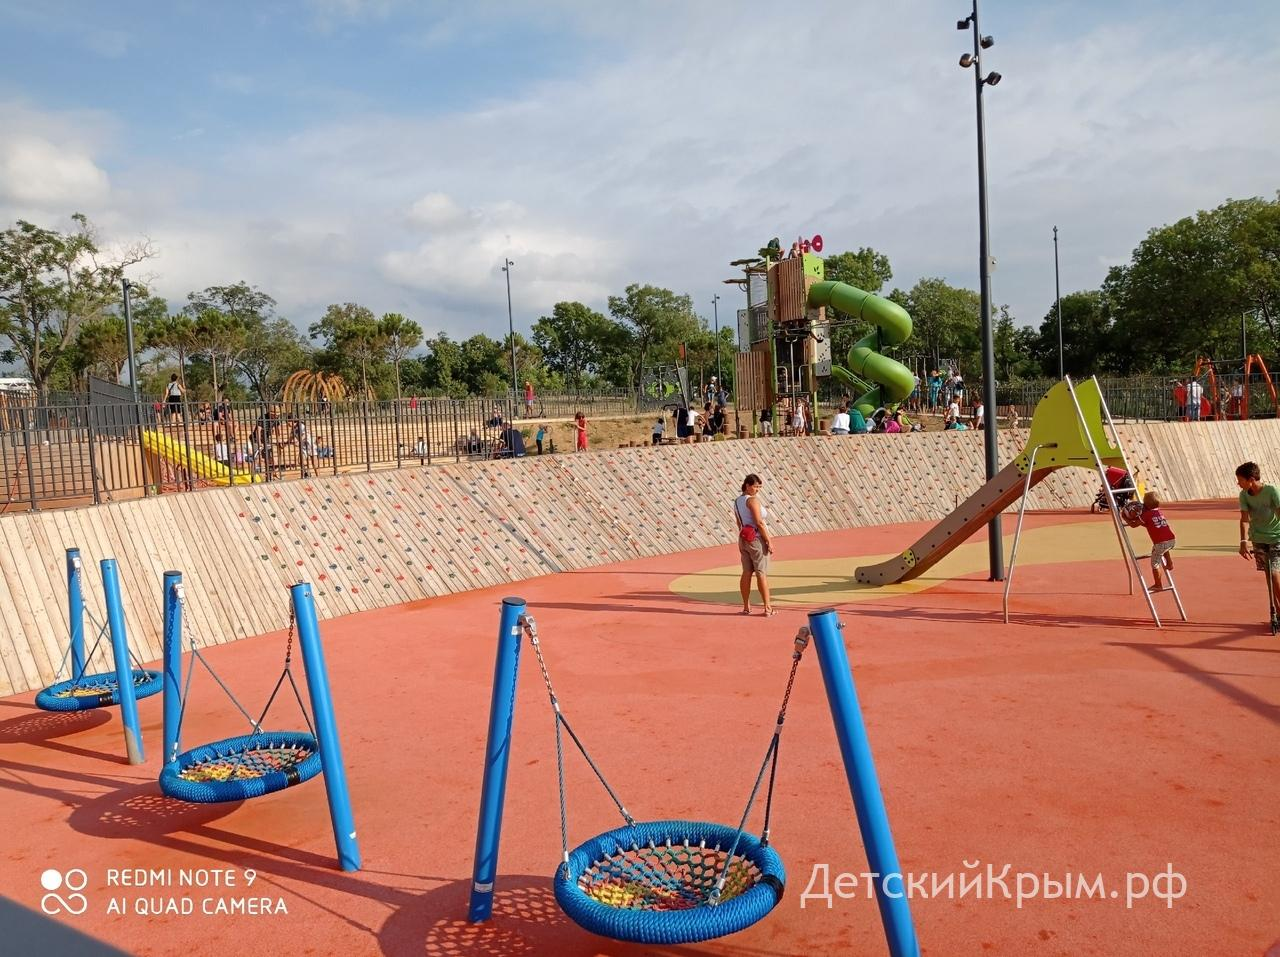 учкуевка парк 6